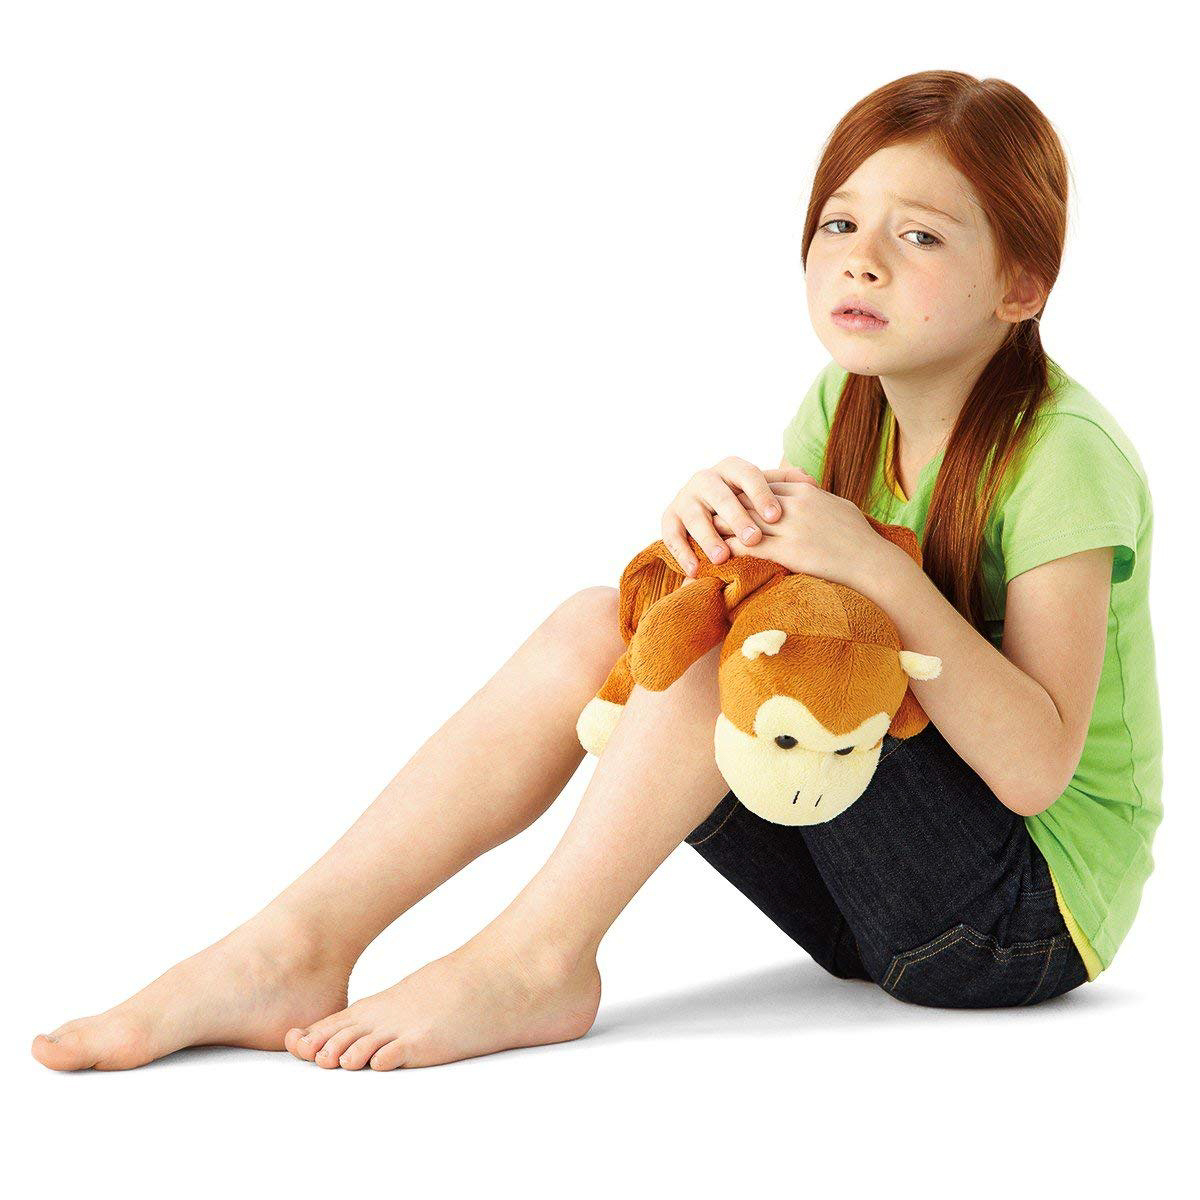 Sunbeam Stuffed Animals Kids Gel Ice Packs for Injuries Reusable Hot ... f75866251e